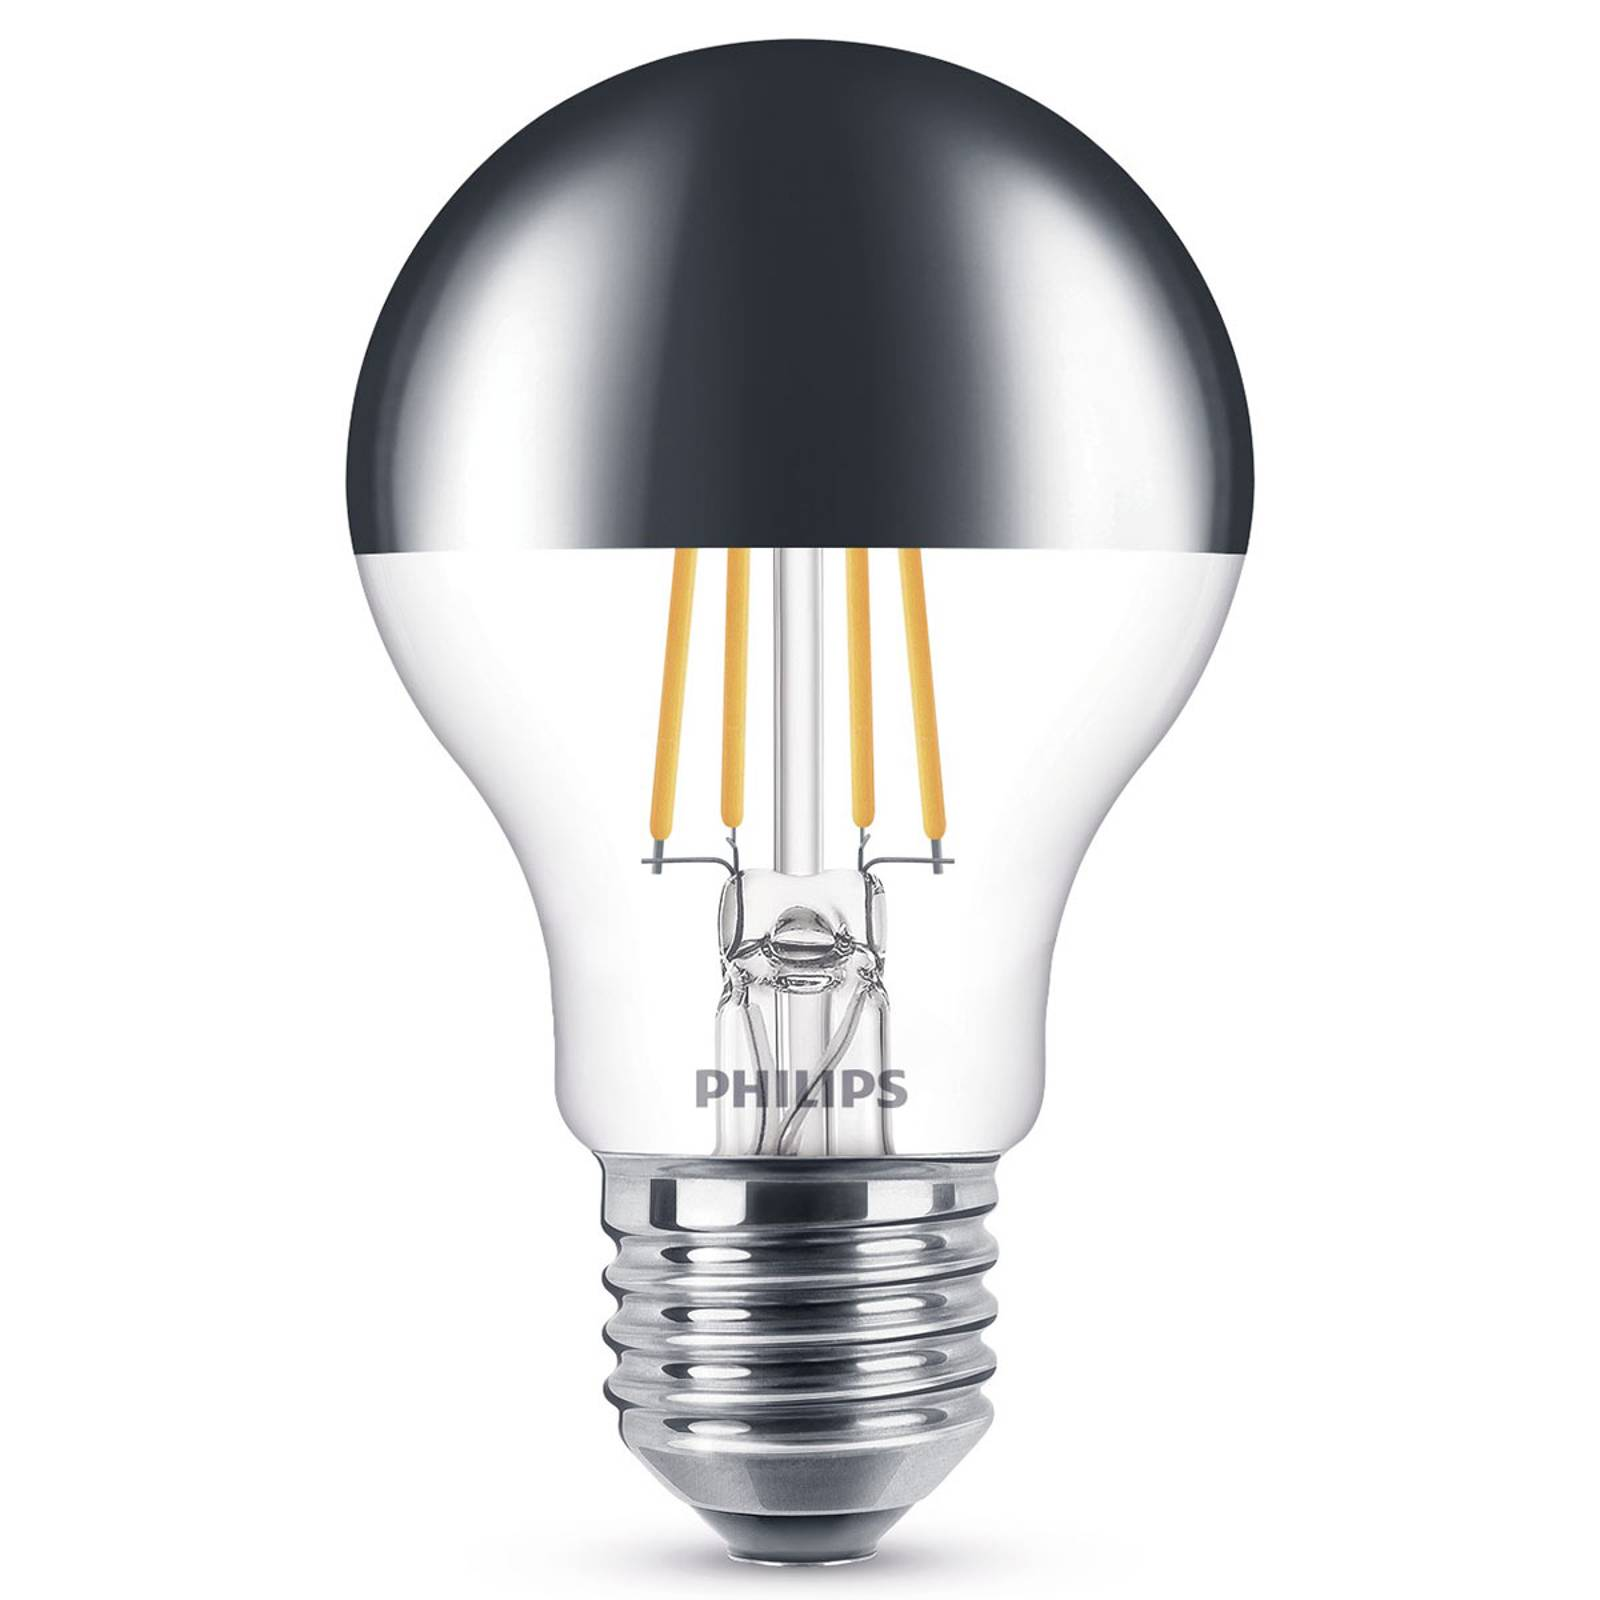 Philips E27 LED-pääpeililamppu 7,2W